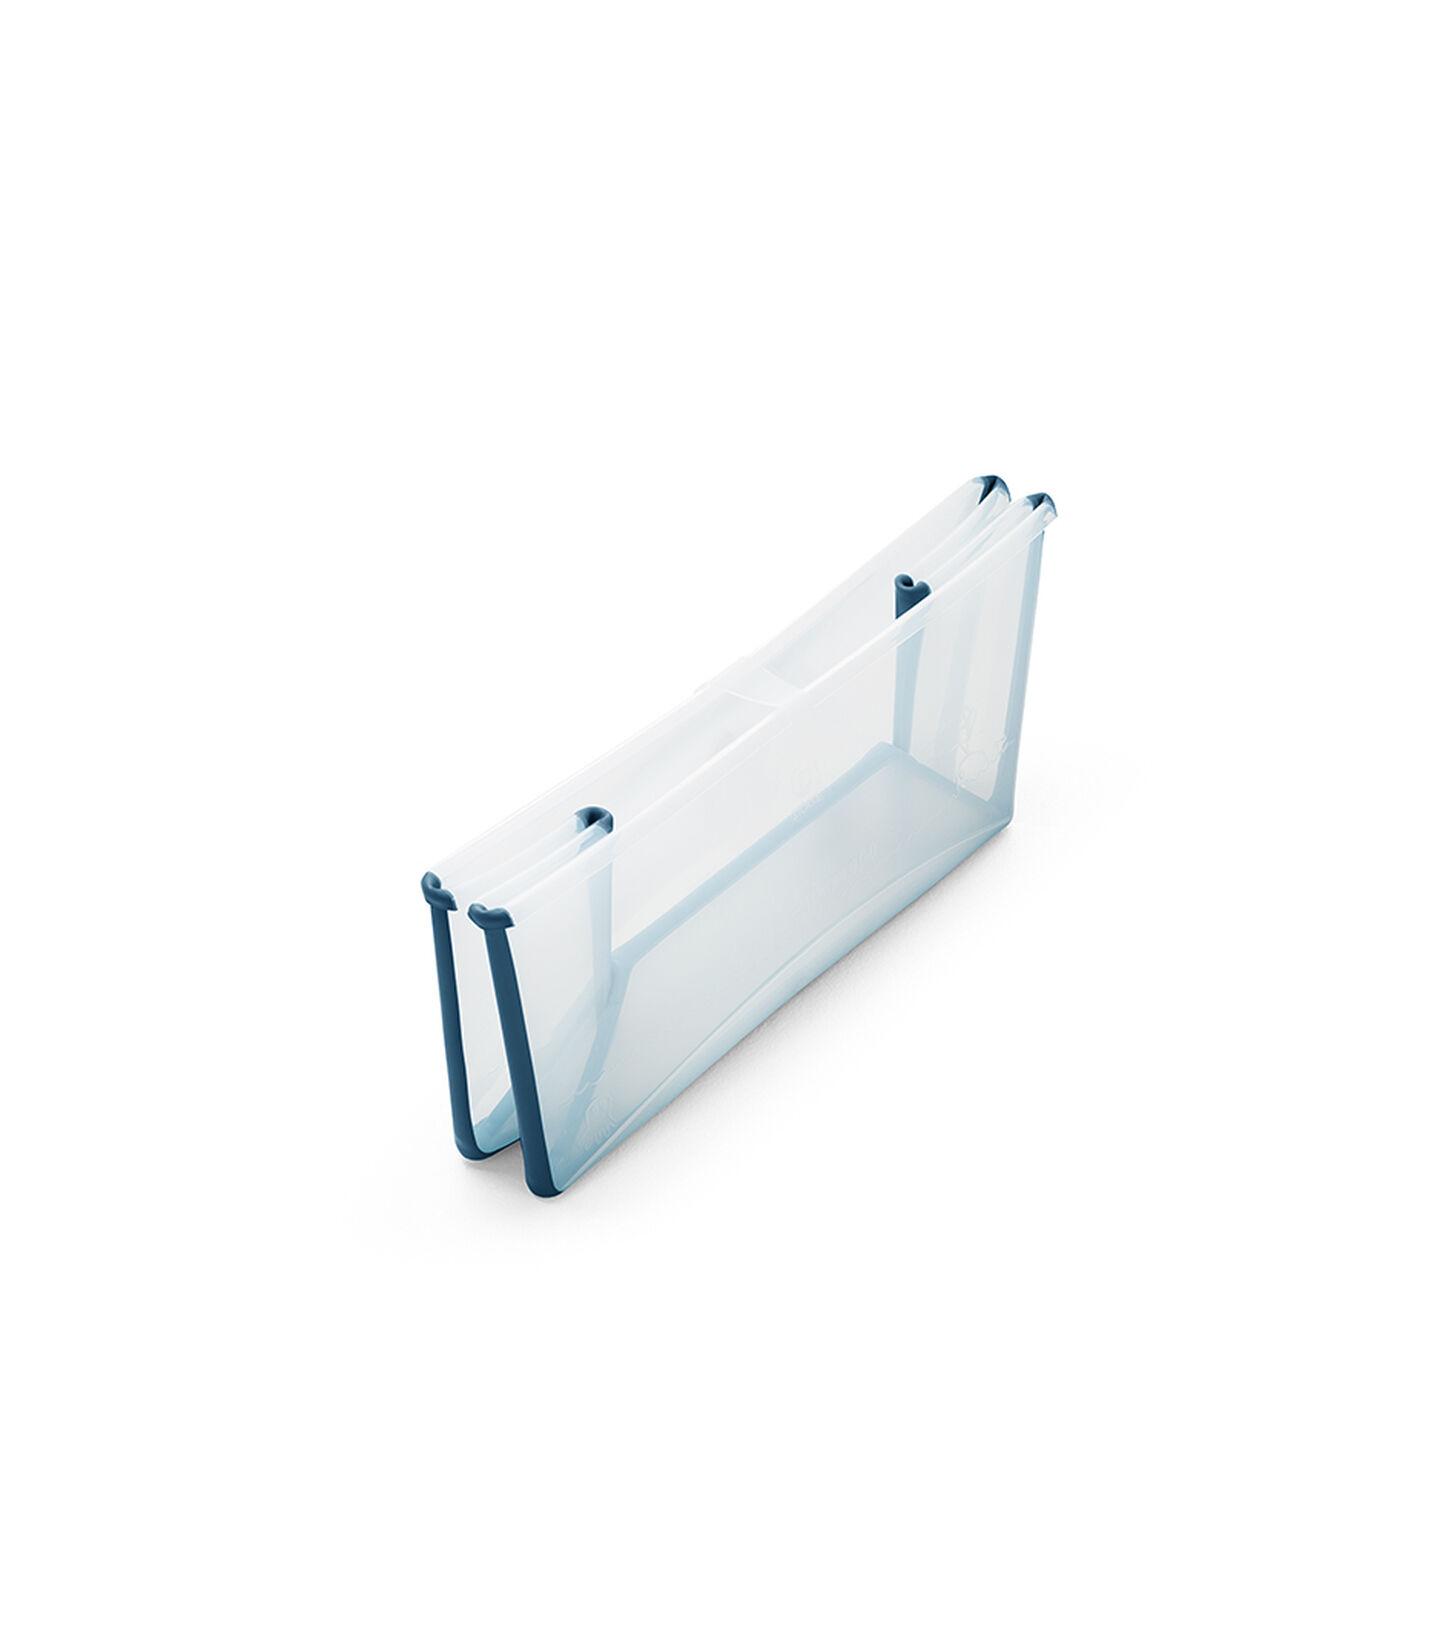 Stokke® Flexi Bath® bath tub, Transparent Blue. Folded.